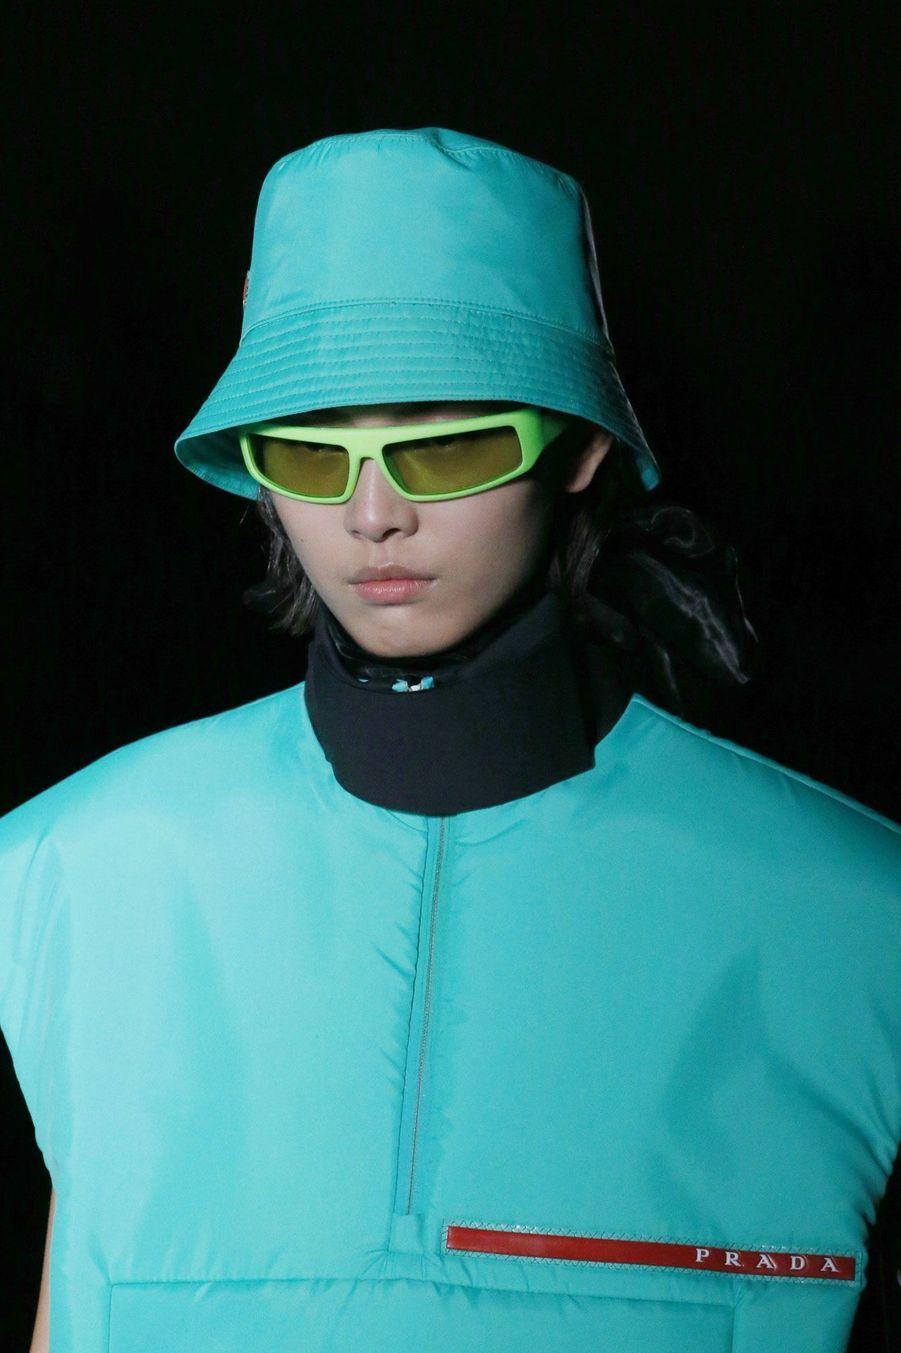 Vives couleurs pour Prada, à Milan